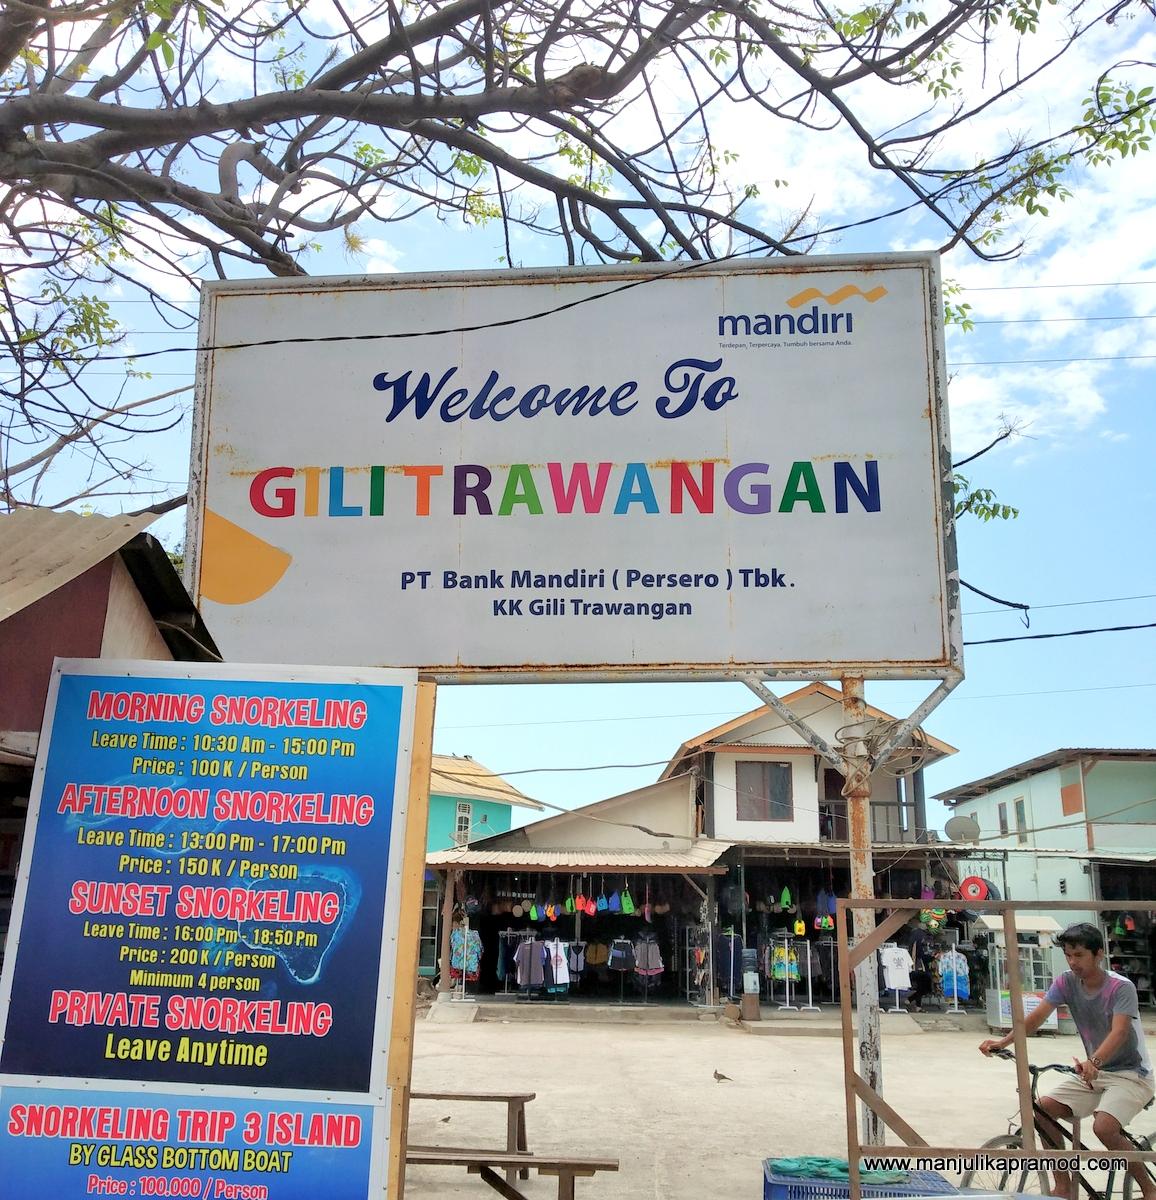 Welcome to GILLITRAWANGAN